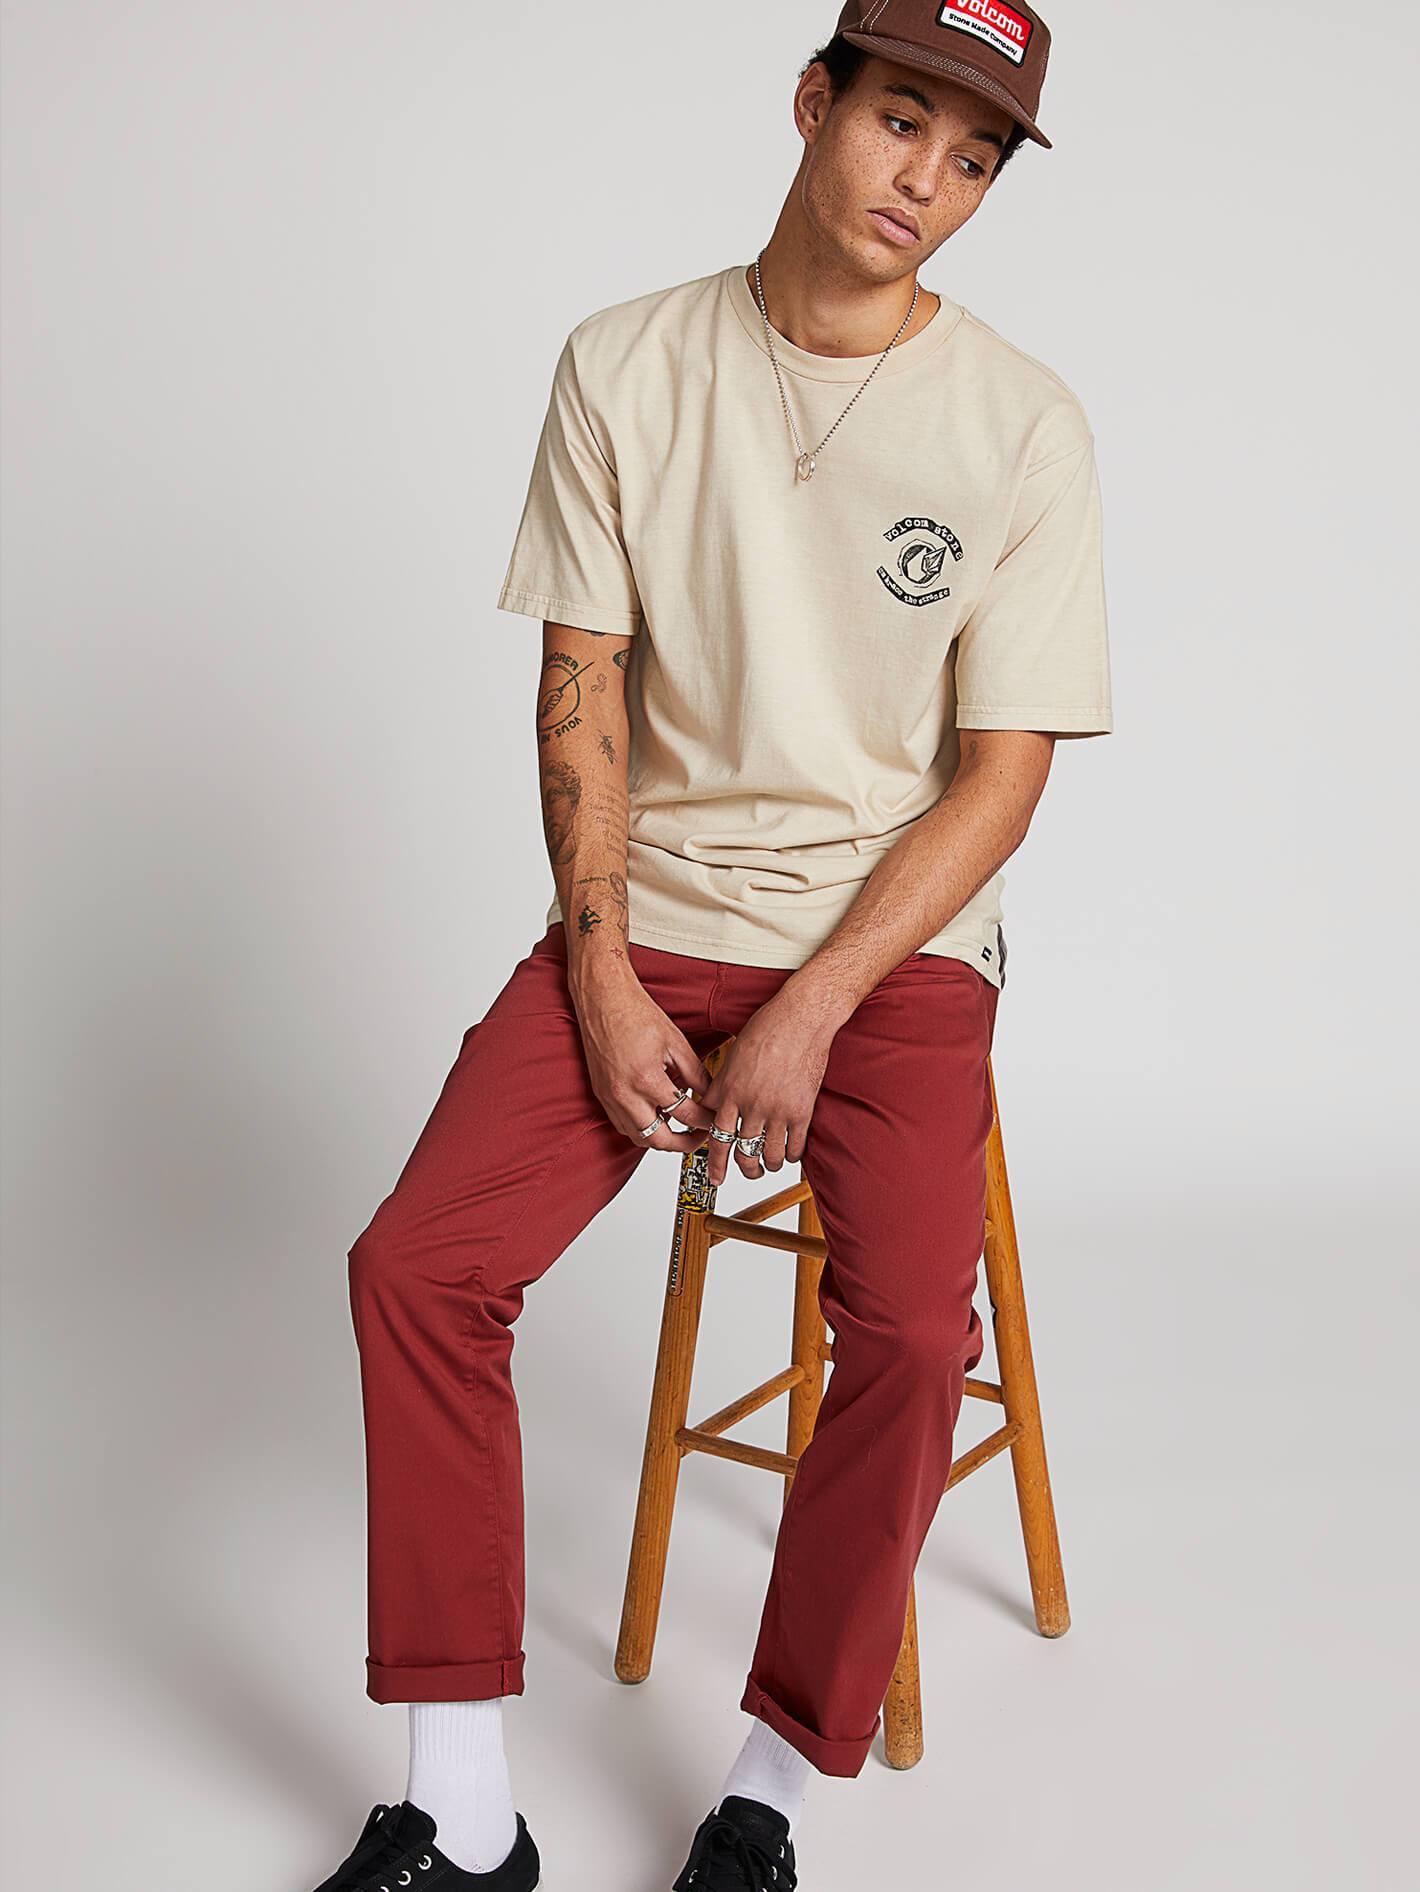 Frickin Modern Stretch Chino Pants - Cowhide - COWHIDE / 28 / 34